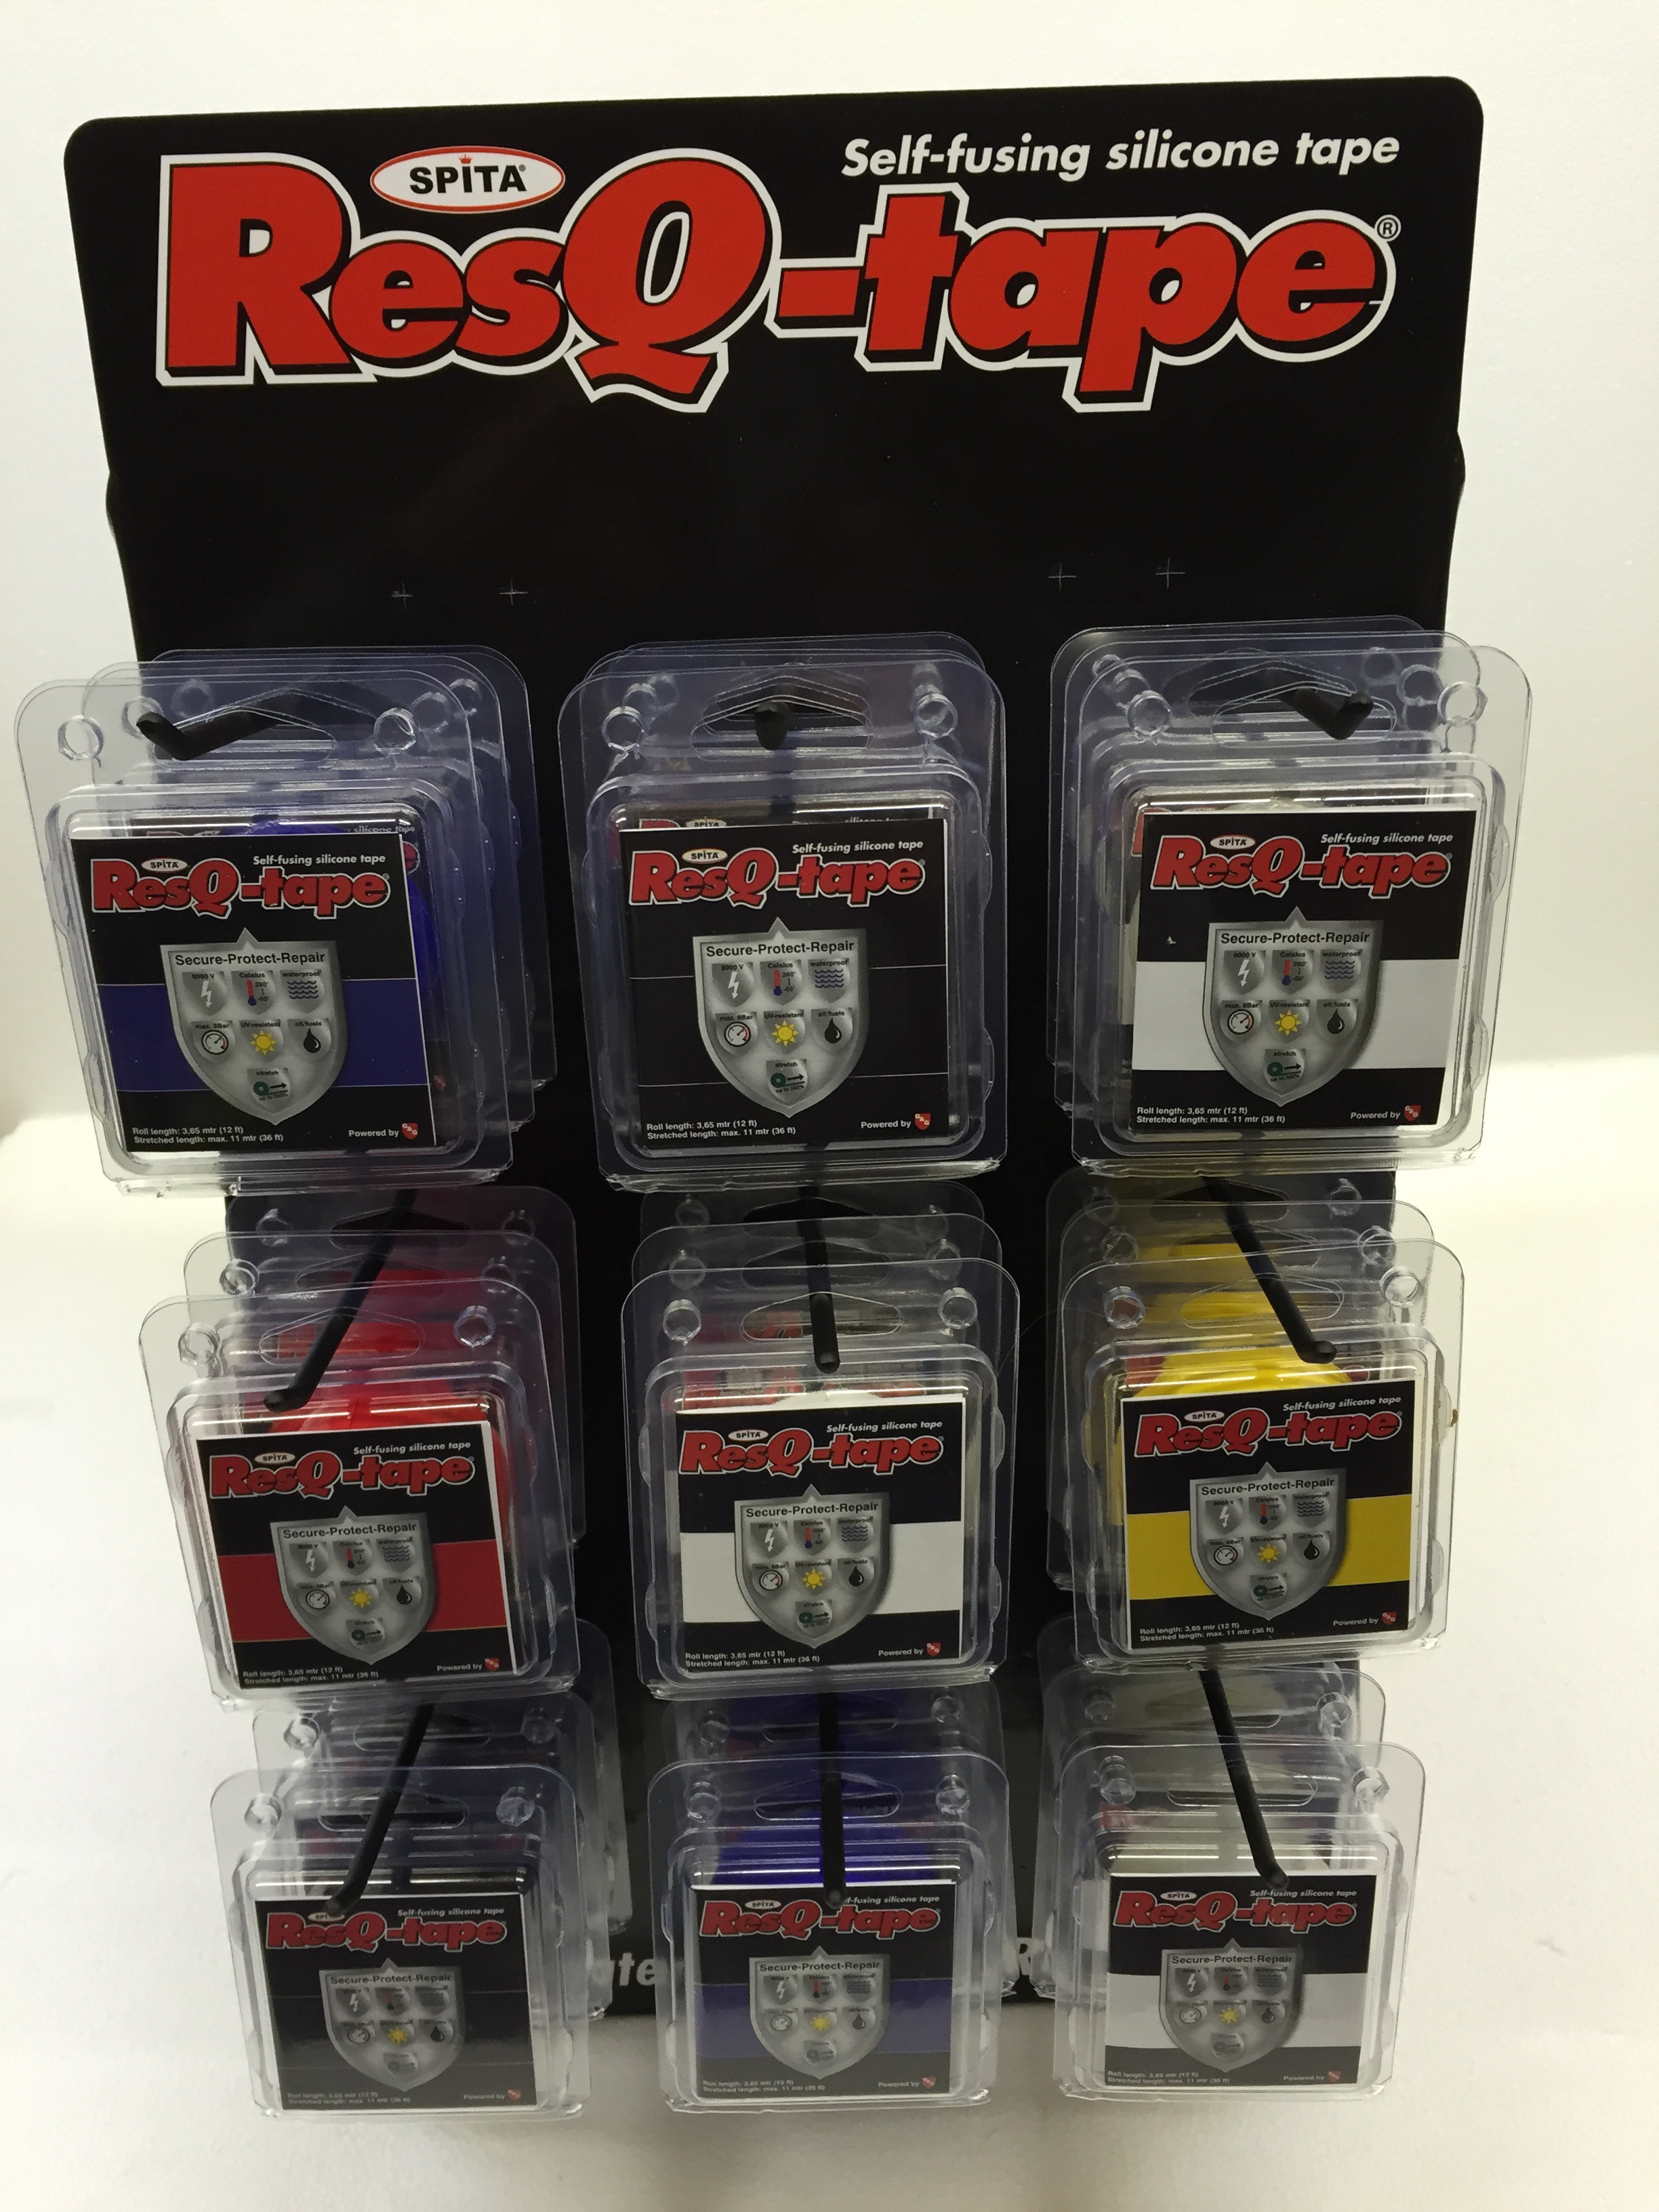 ResQ tape